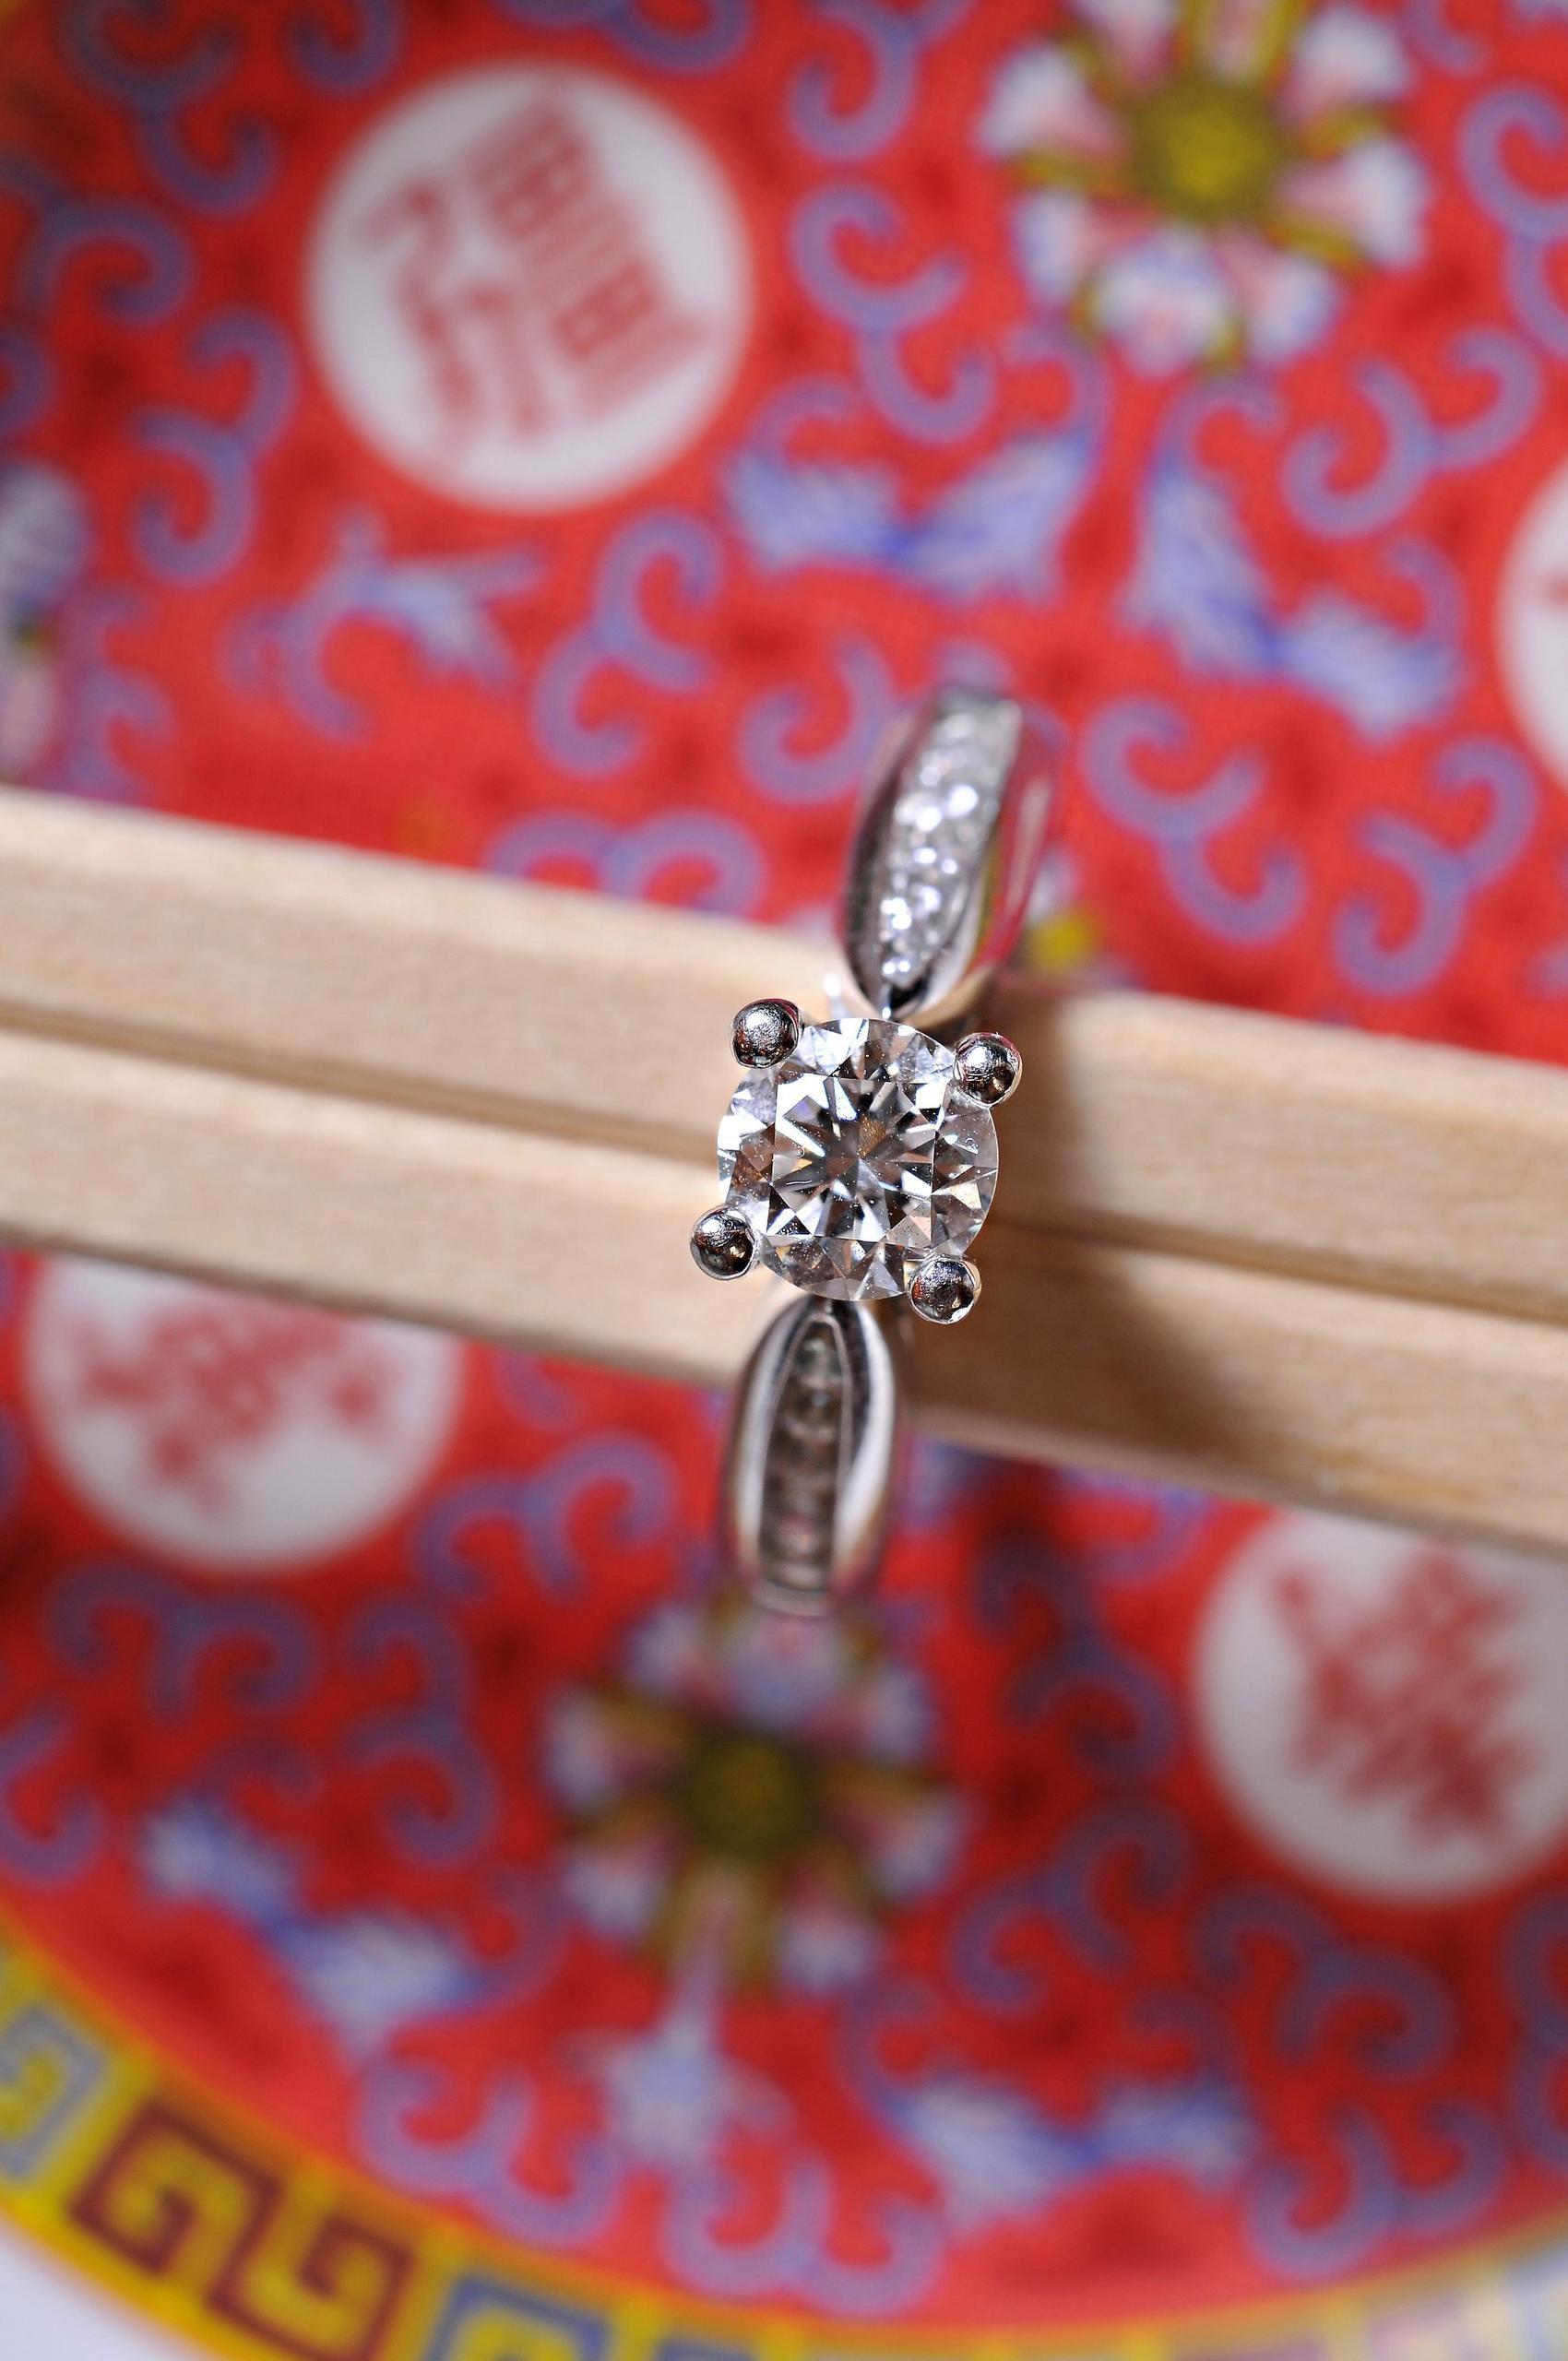 My Engagement Ring  Weddings Photo 13940898  Fanpop